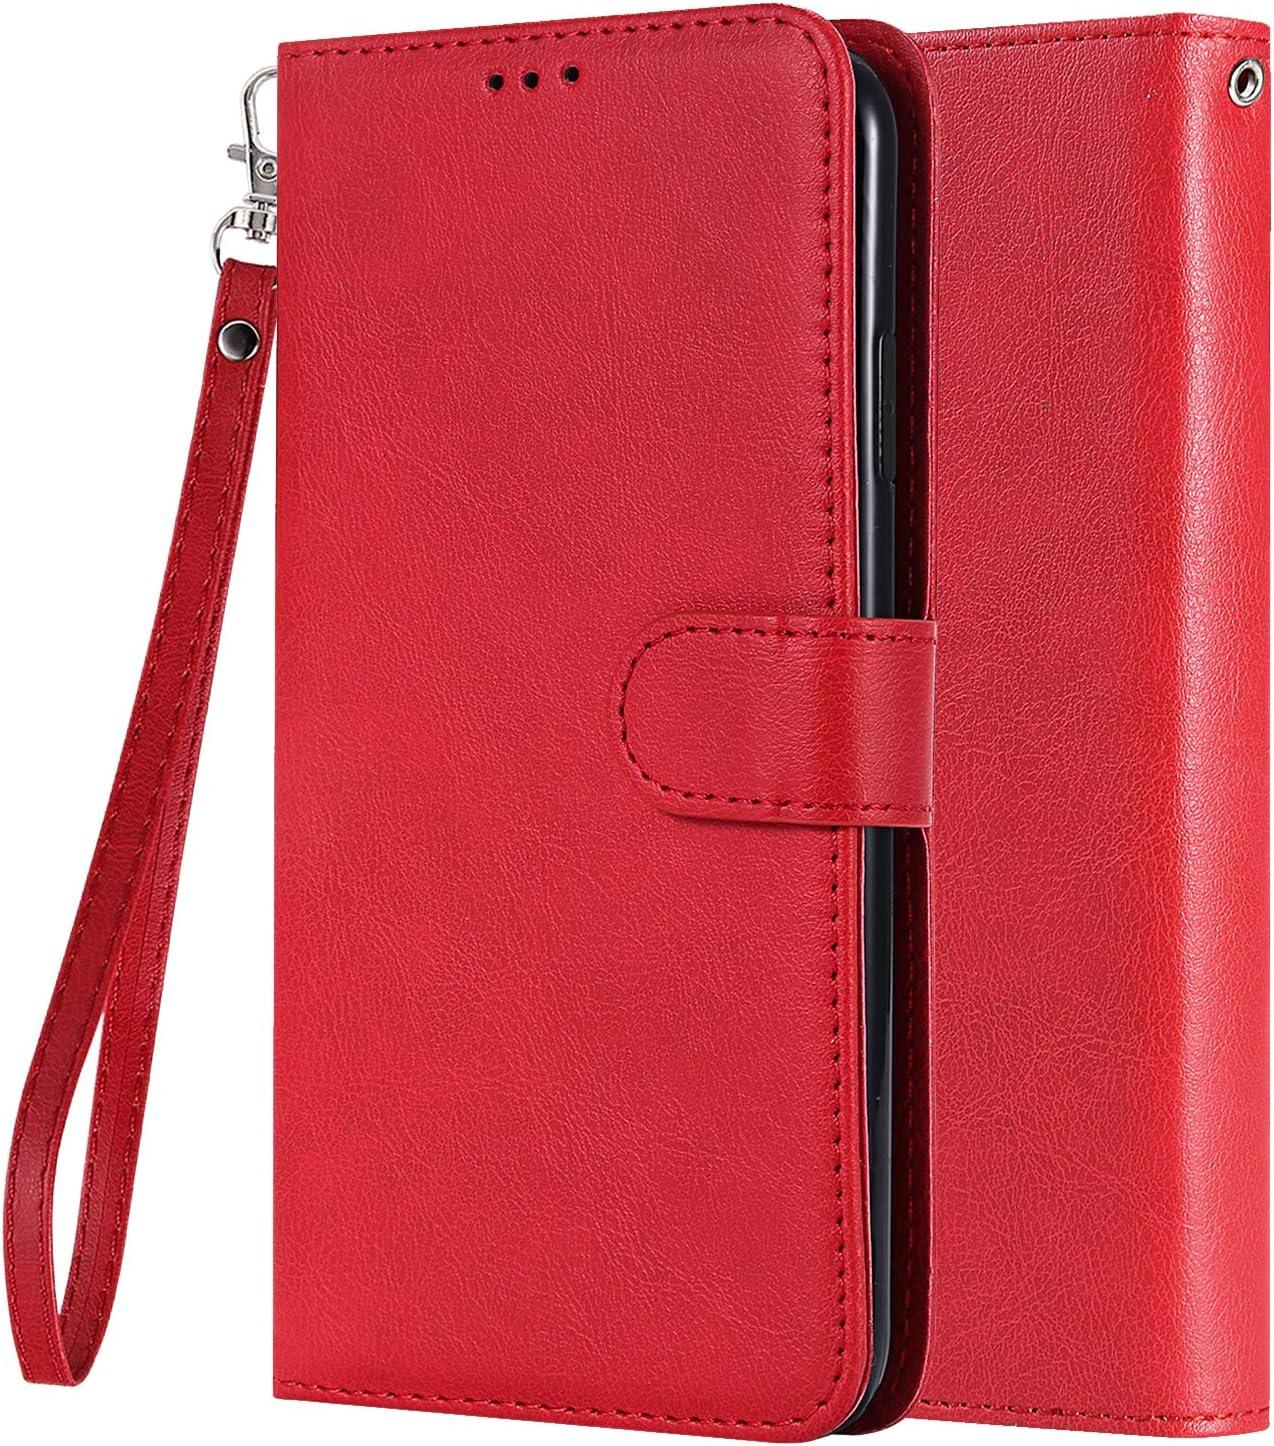 LEMORRY Carcasa para Xiaomi Mi A2 Lite (Redmi 6 Pro) Funda Estuches Multifuncional Piel Cuero Billetera Cover con 2in1 Tarjeteros Magnética Suave TPU Silicona Tapa Funda Xiaomi Mi A2 Lite (Rojo)